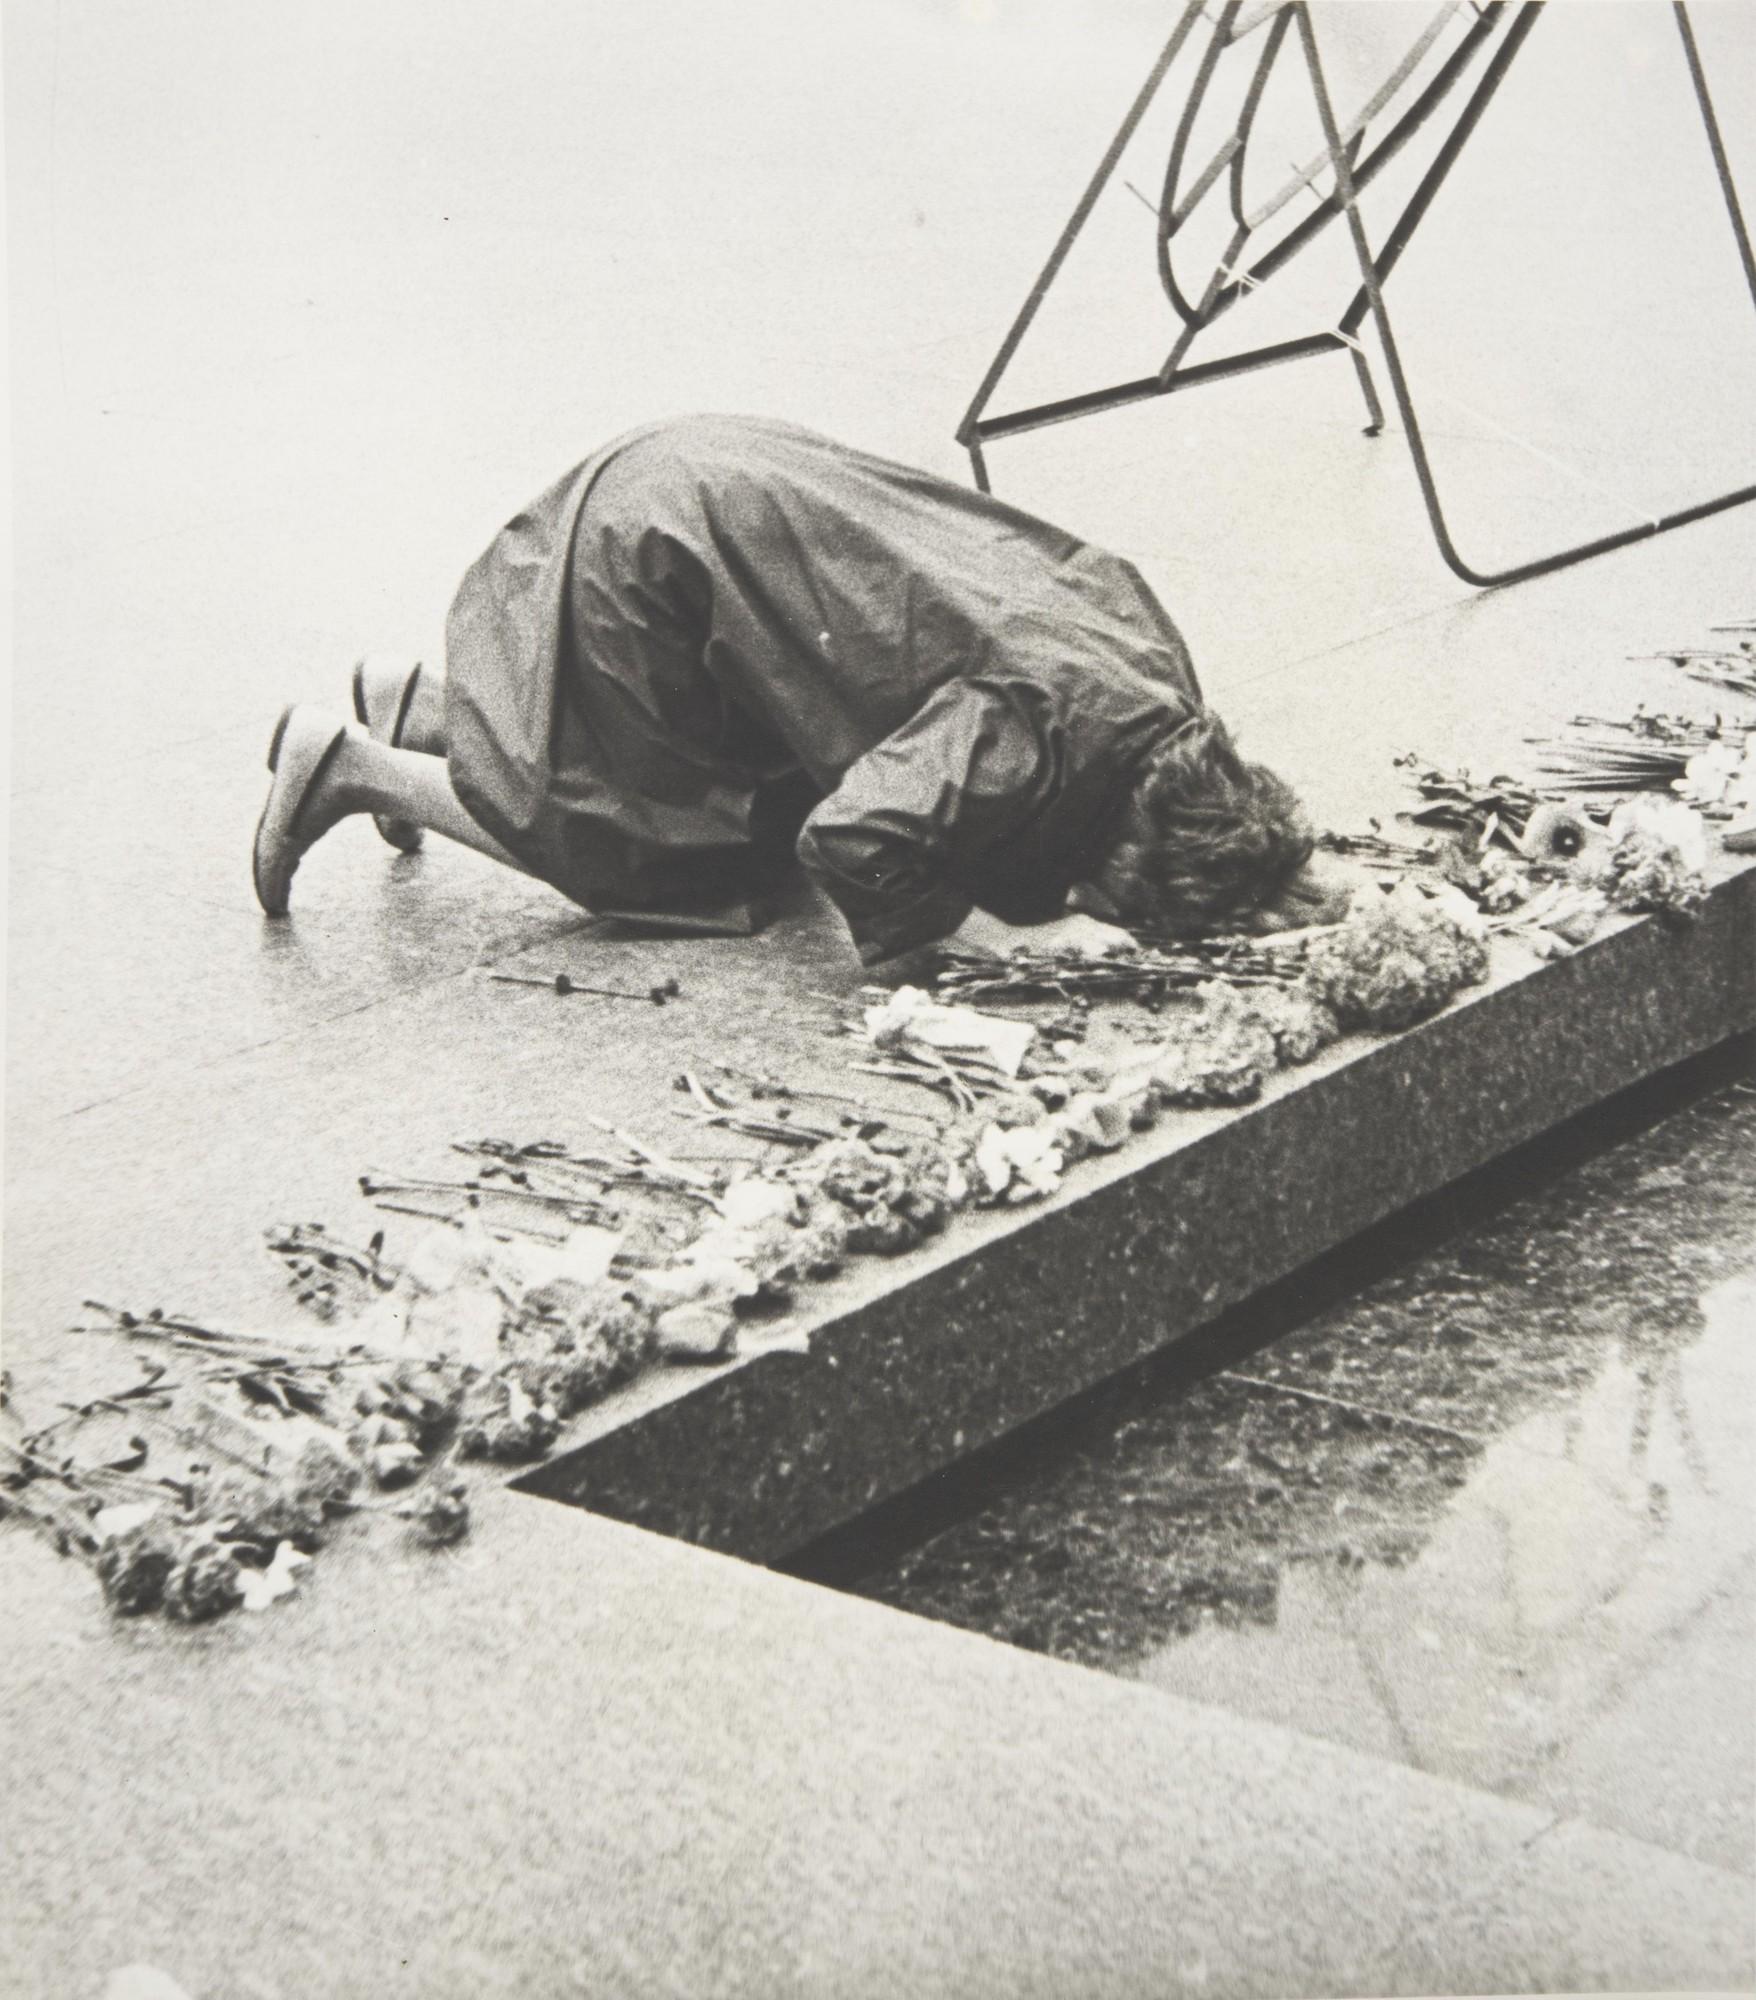 1960-е. У могилы неизвестного солдата